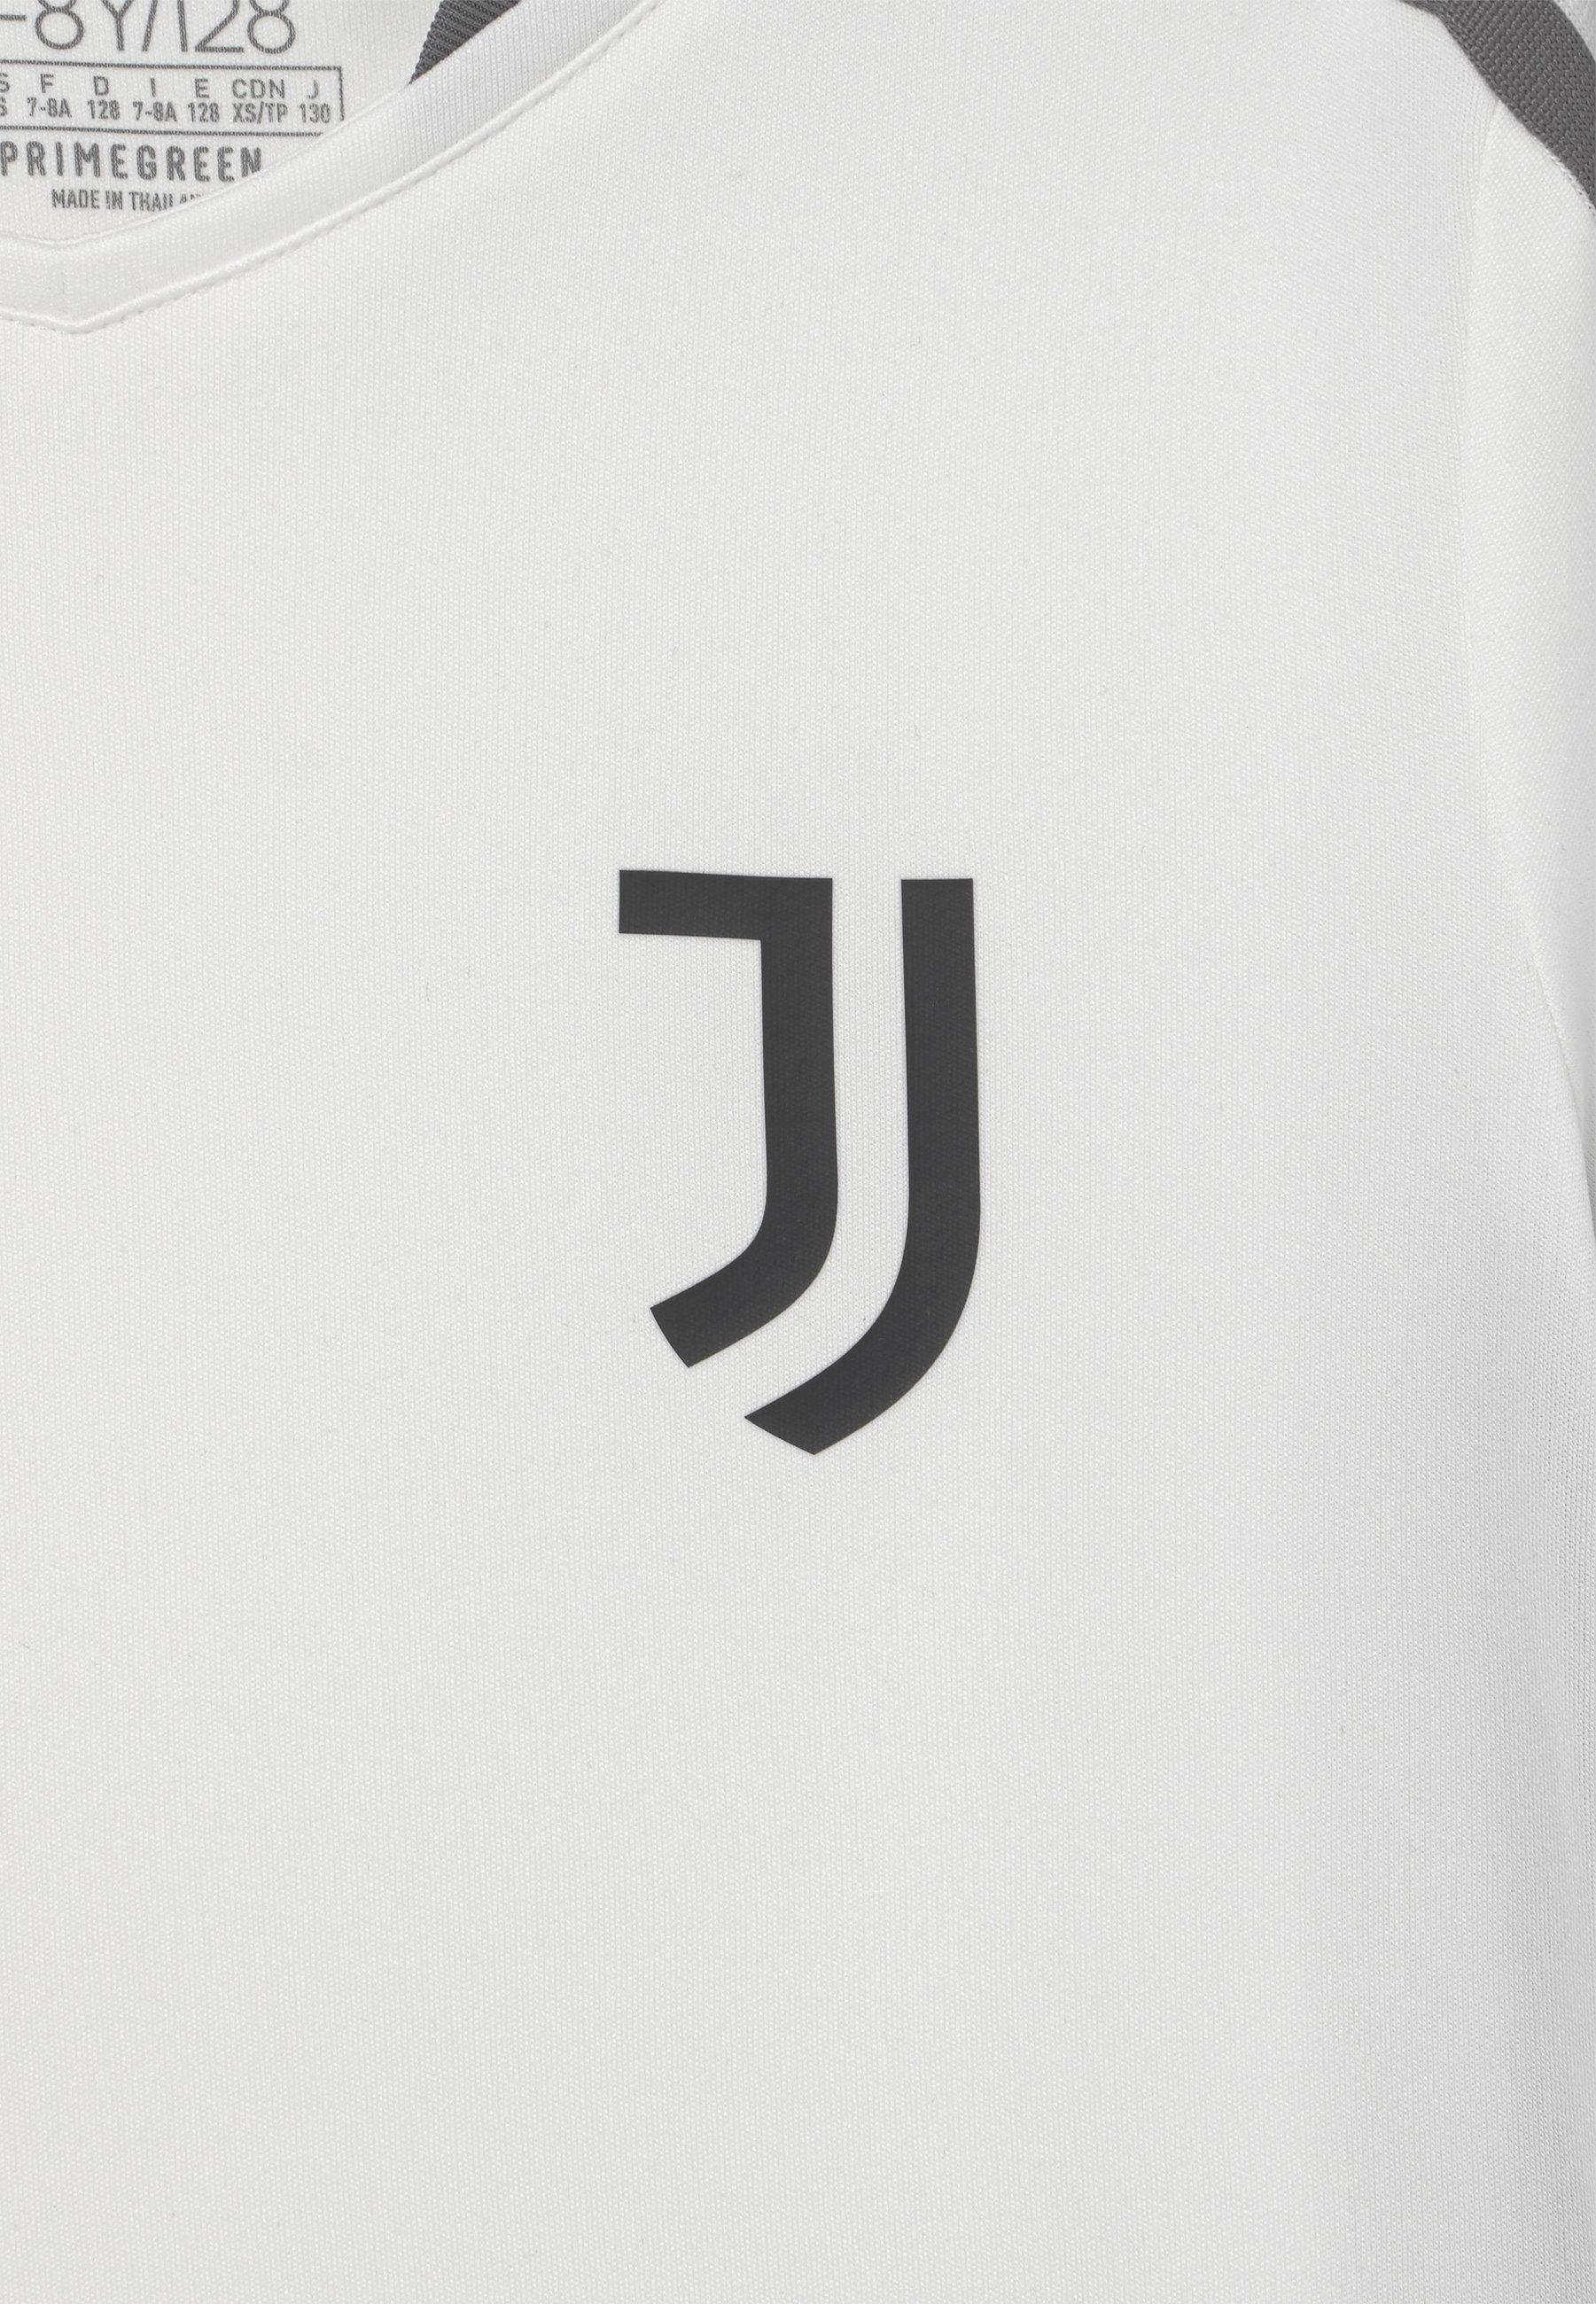 Bambini JUVENTUS FOOTBALL CLUB UNISEX - Squadra